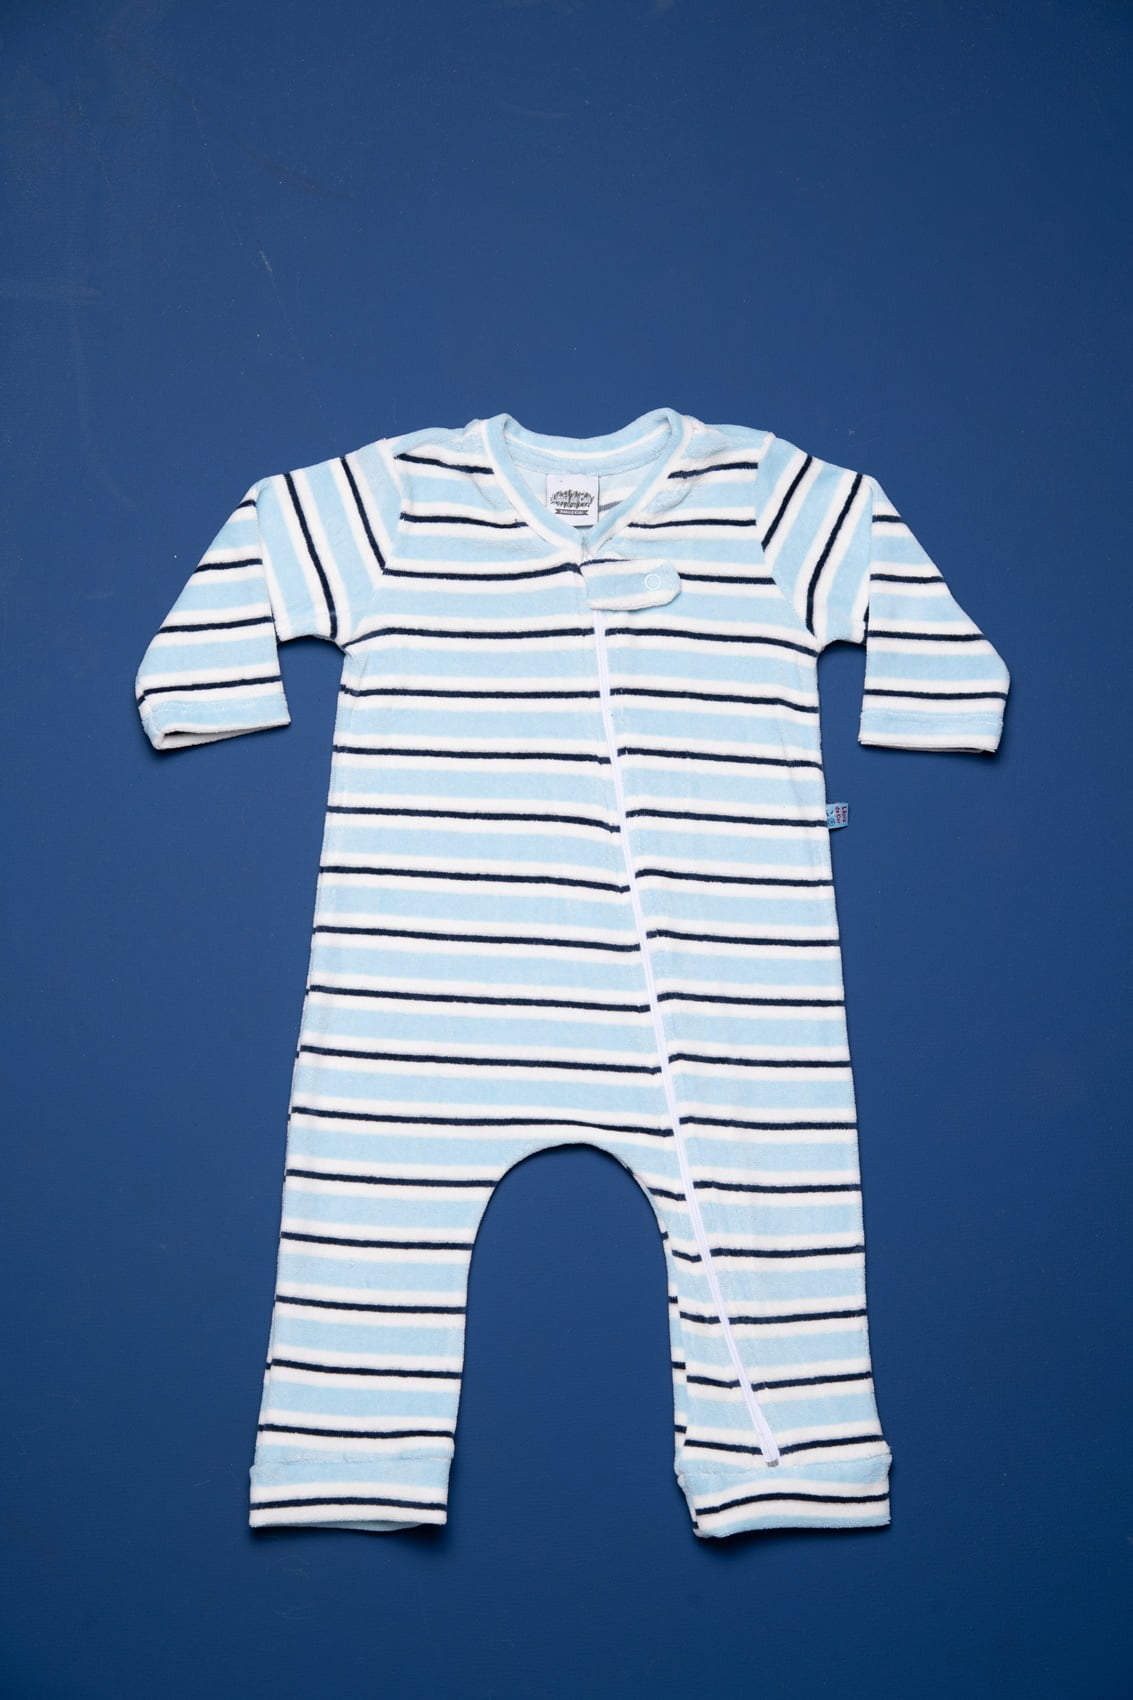 Macacão bebê plush